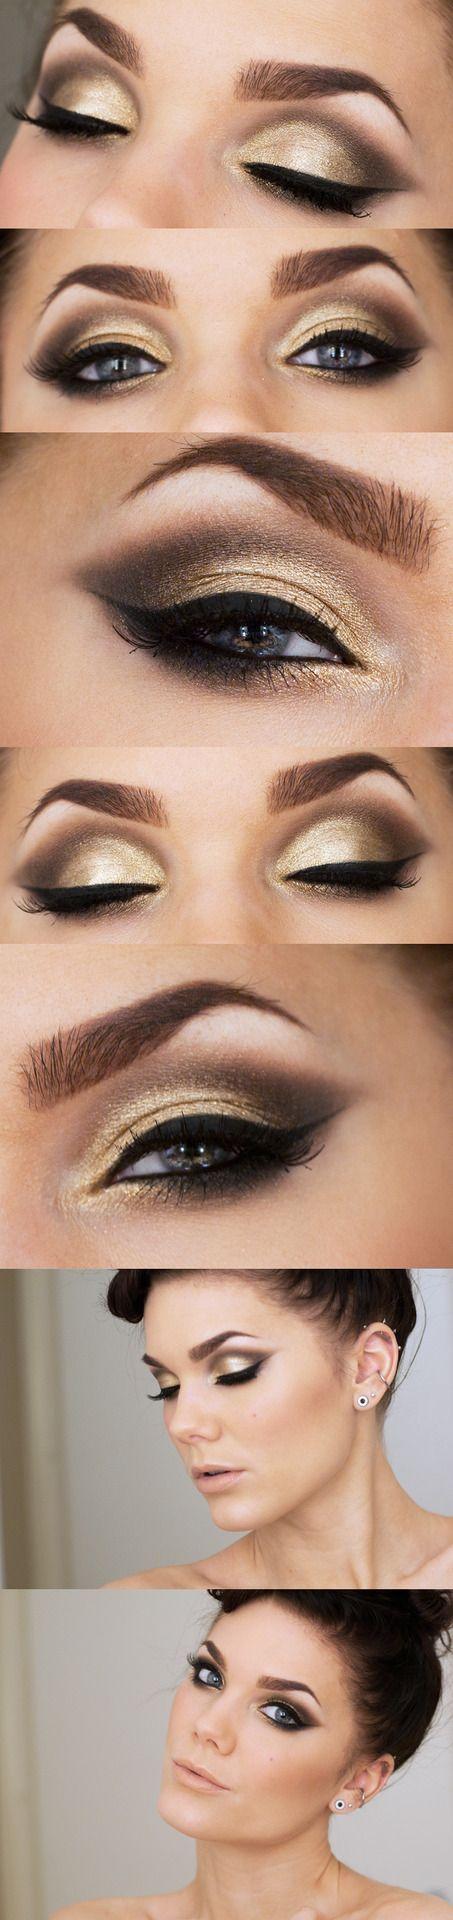 beautyinspo101: Linda Hallberg Follow this blog for everyday beauty inspo!